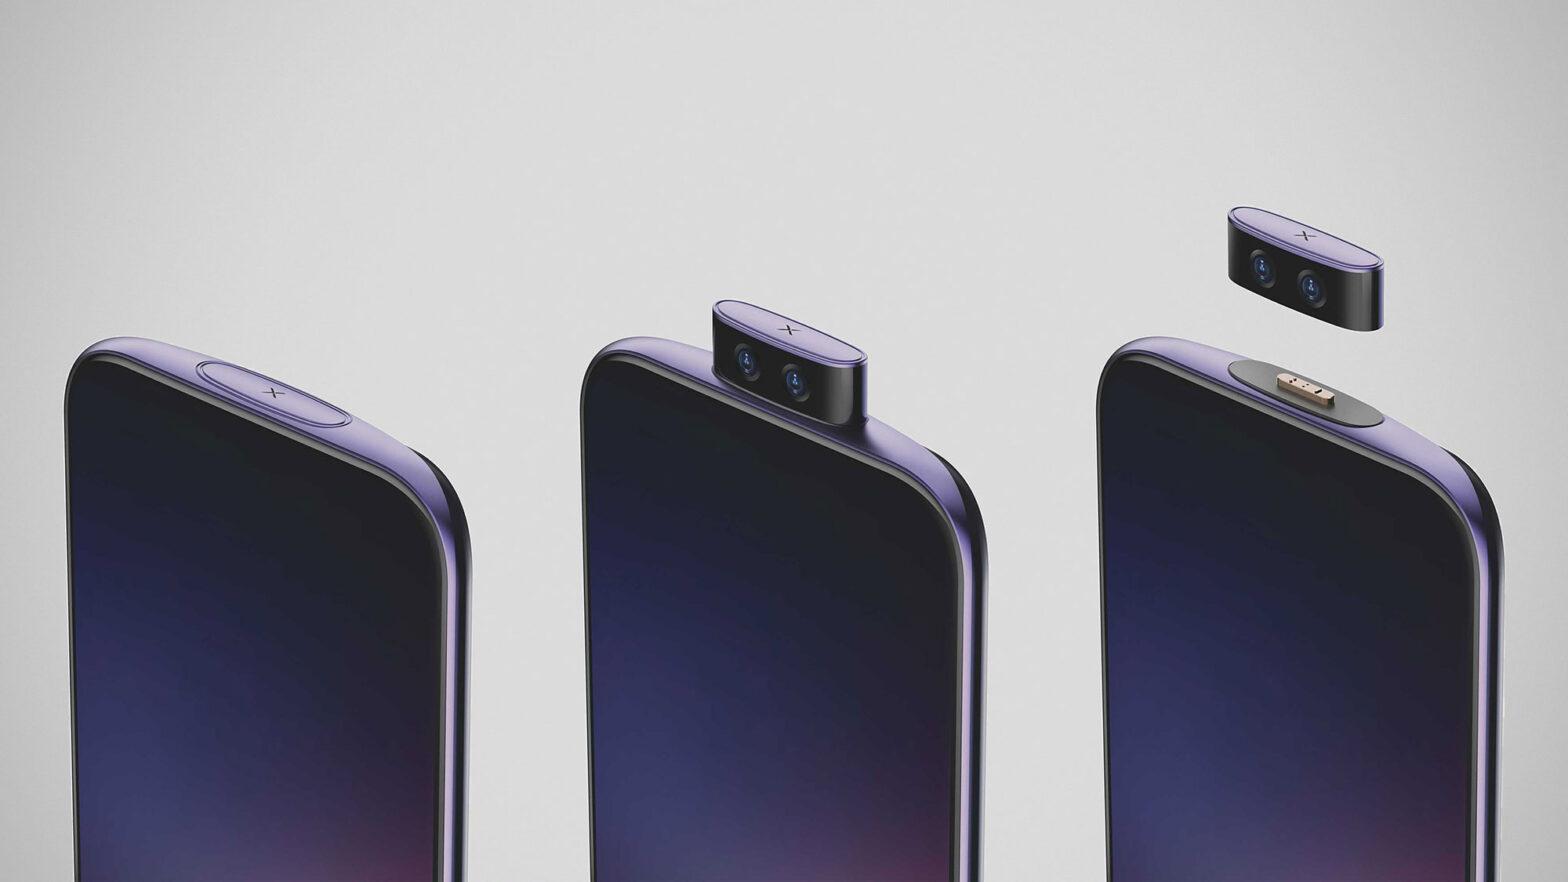 Vivo IFEA Detachable Pop-up Camera Concept Phone